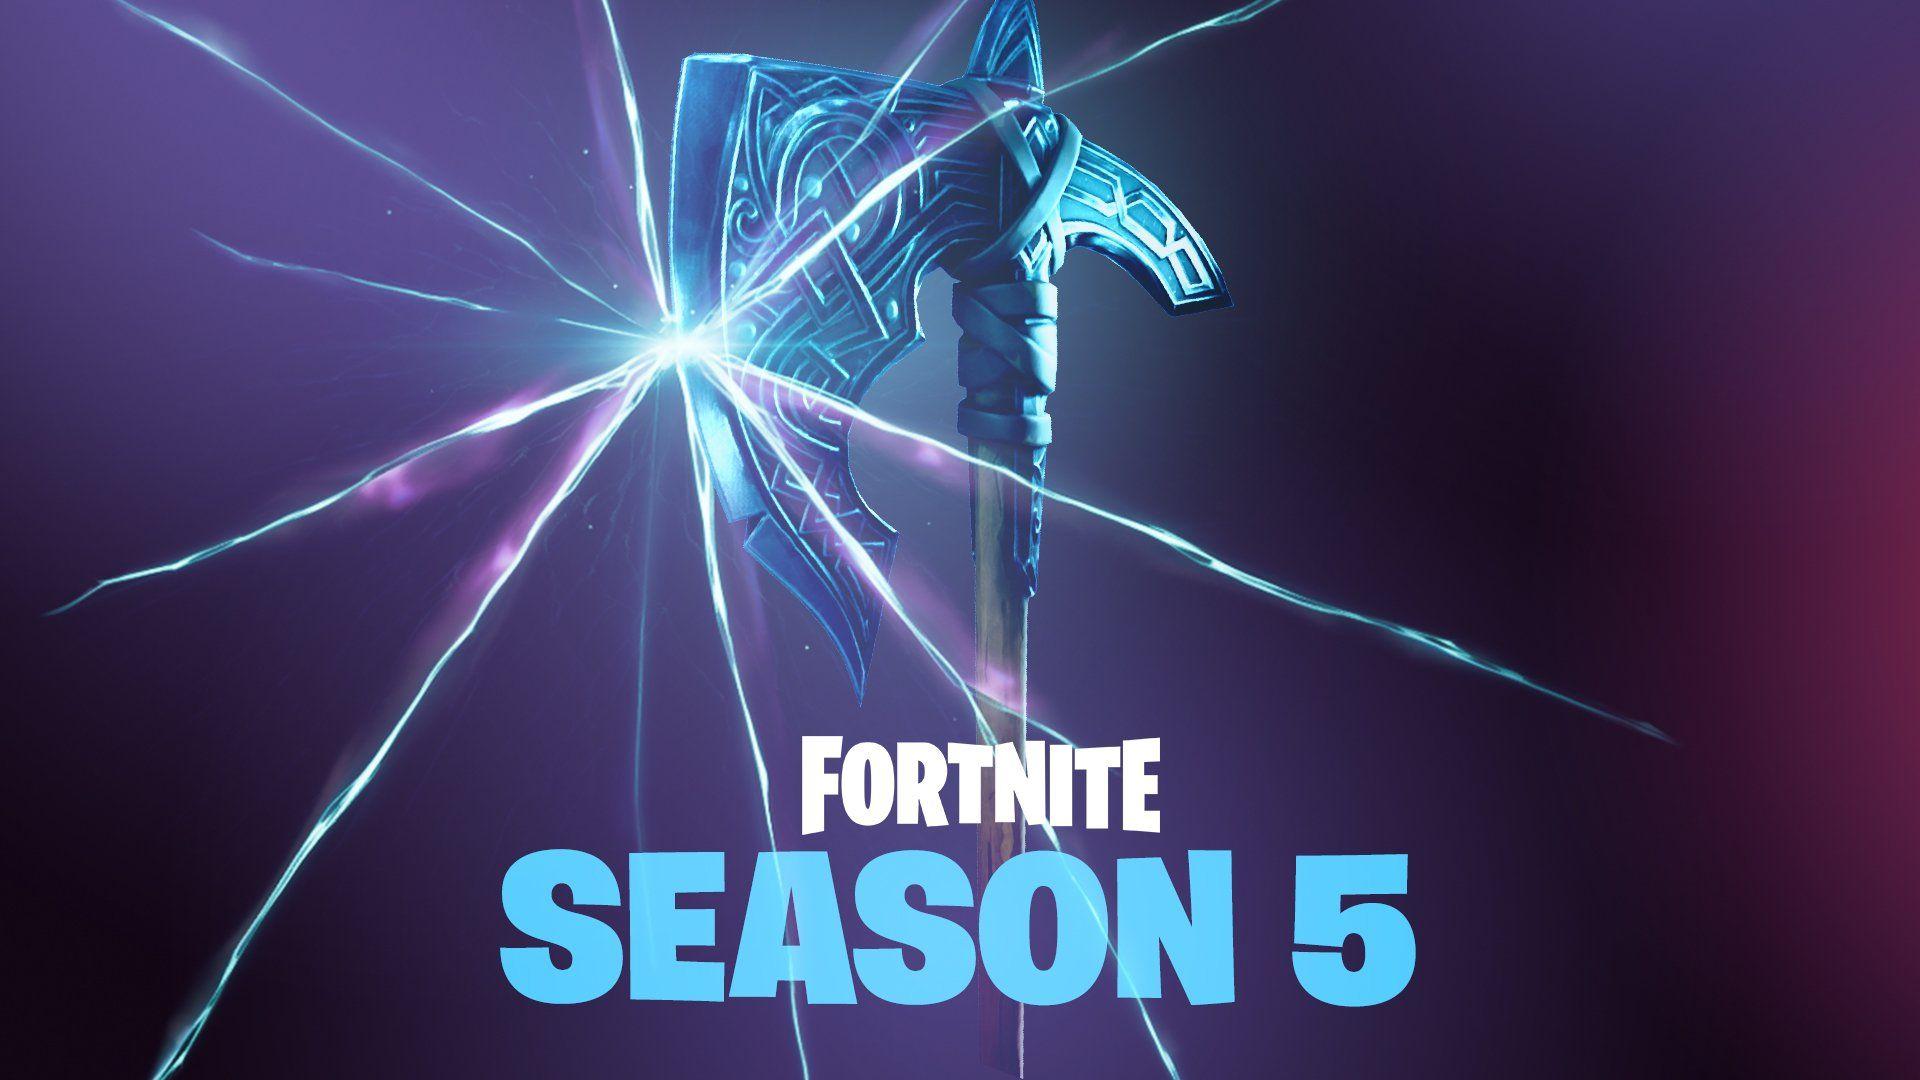 fortnite season 5 - photo #3